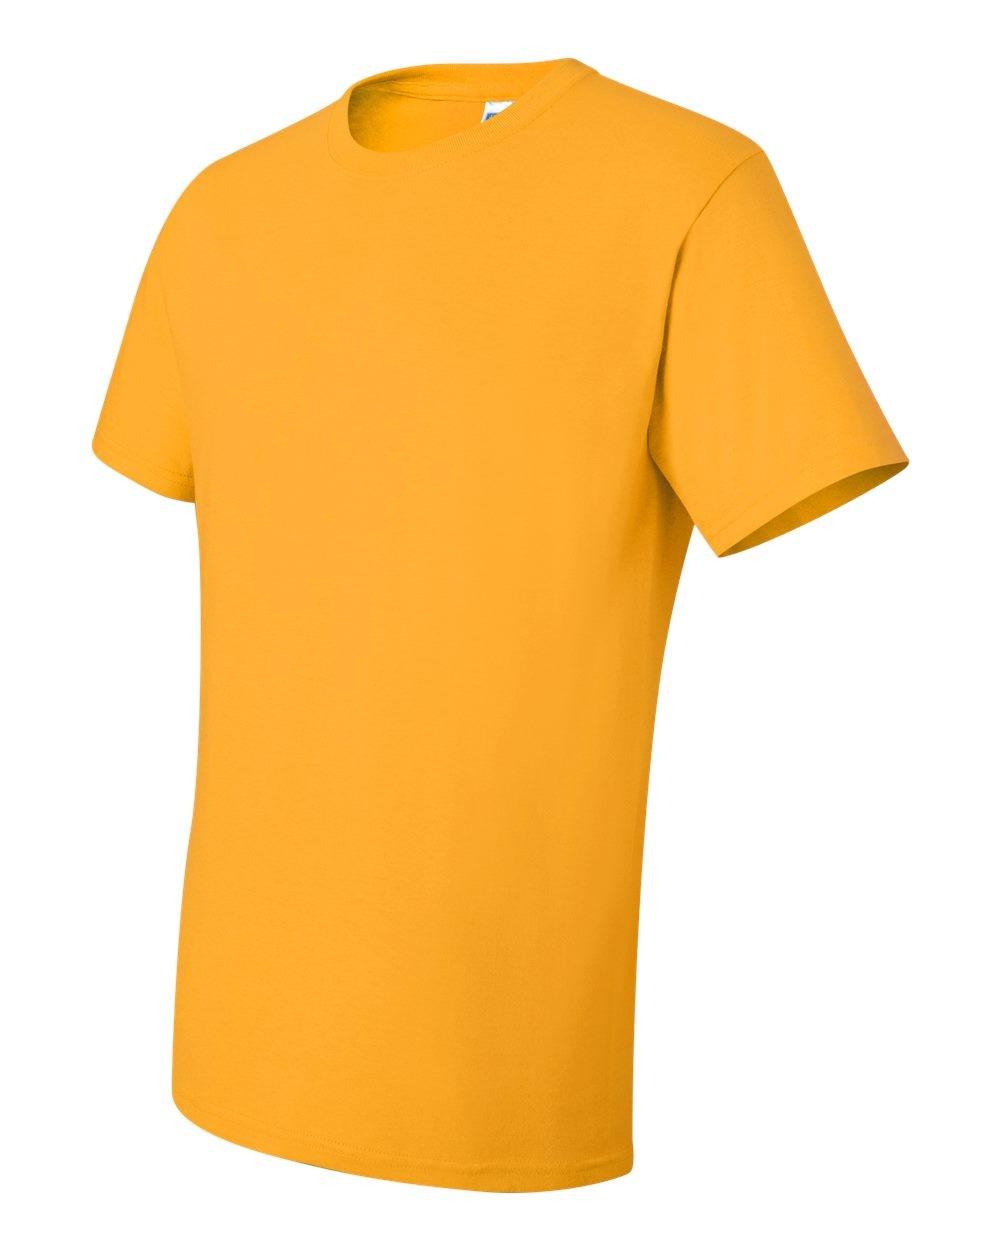 ST. ANN Gym T-Shirt w/ Logo